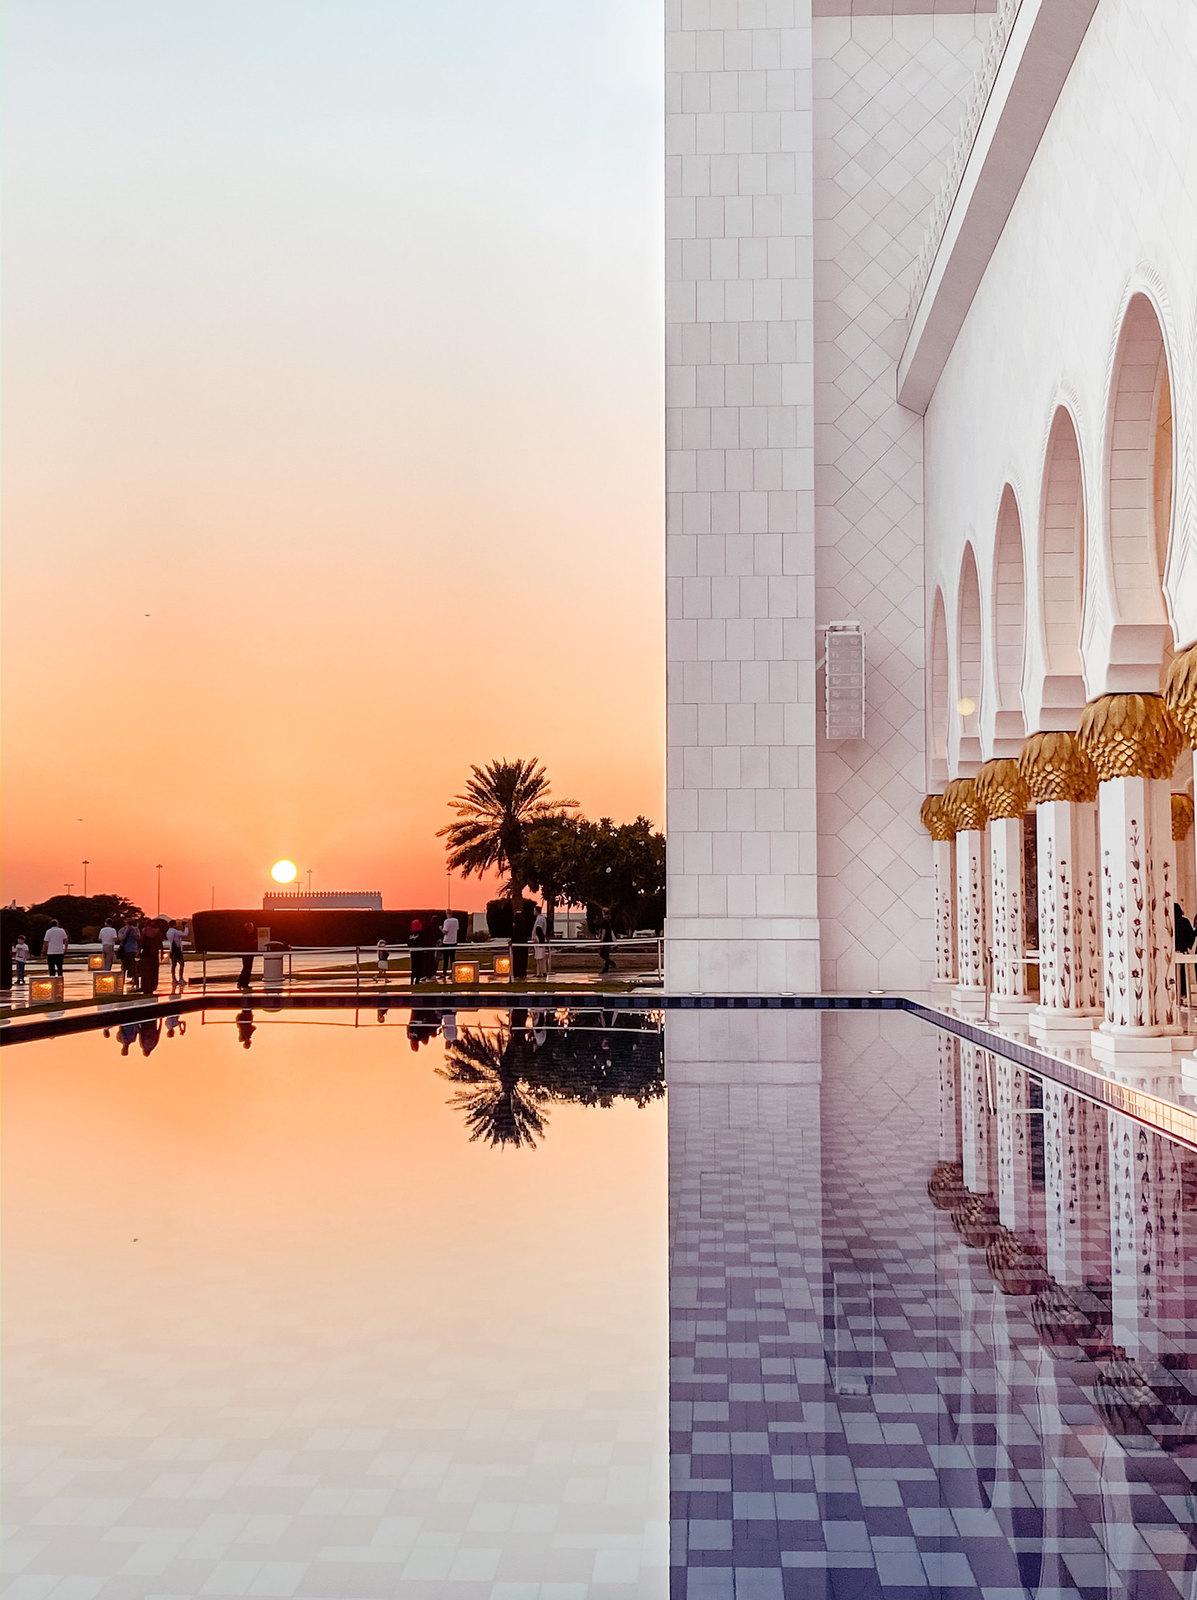 Abu Dhabi matkailu